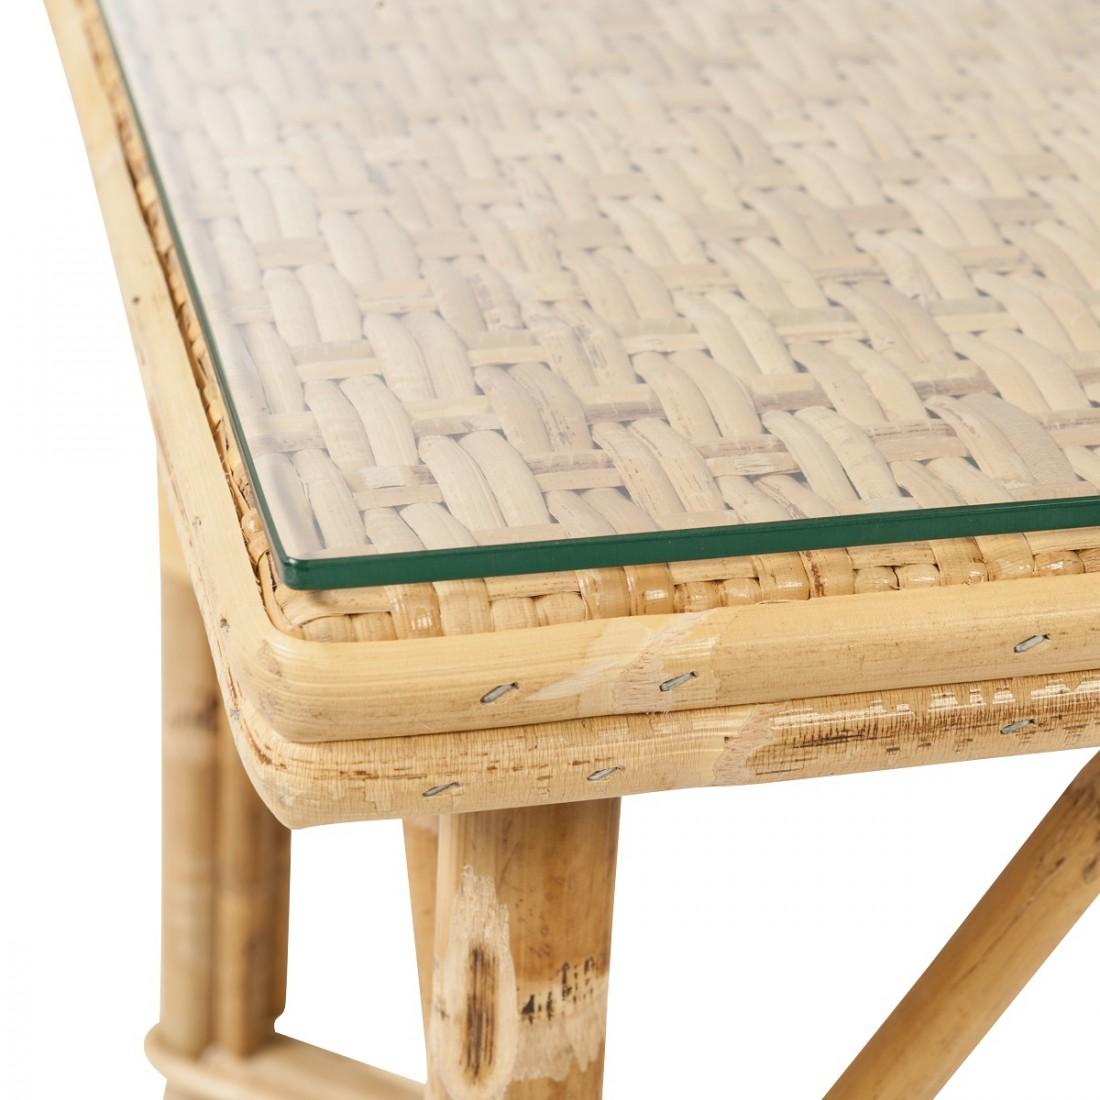 verre pour table basse en rotin grand m re table en rotin. Black Bedroom Furniture Sets. Home Design Ideas